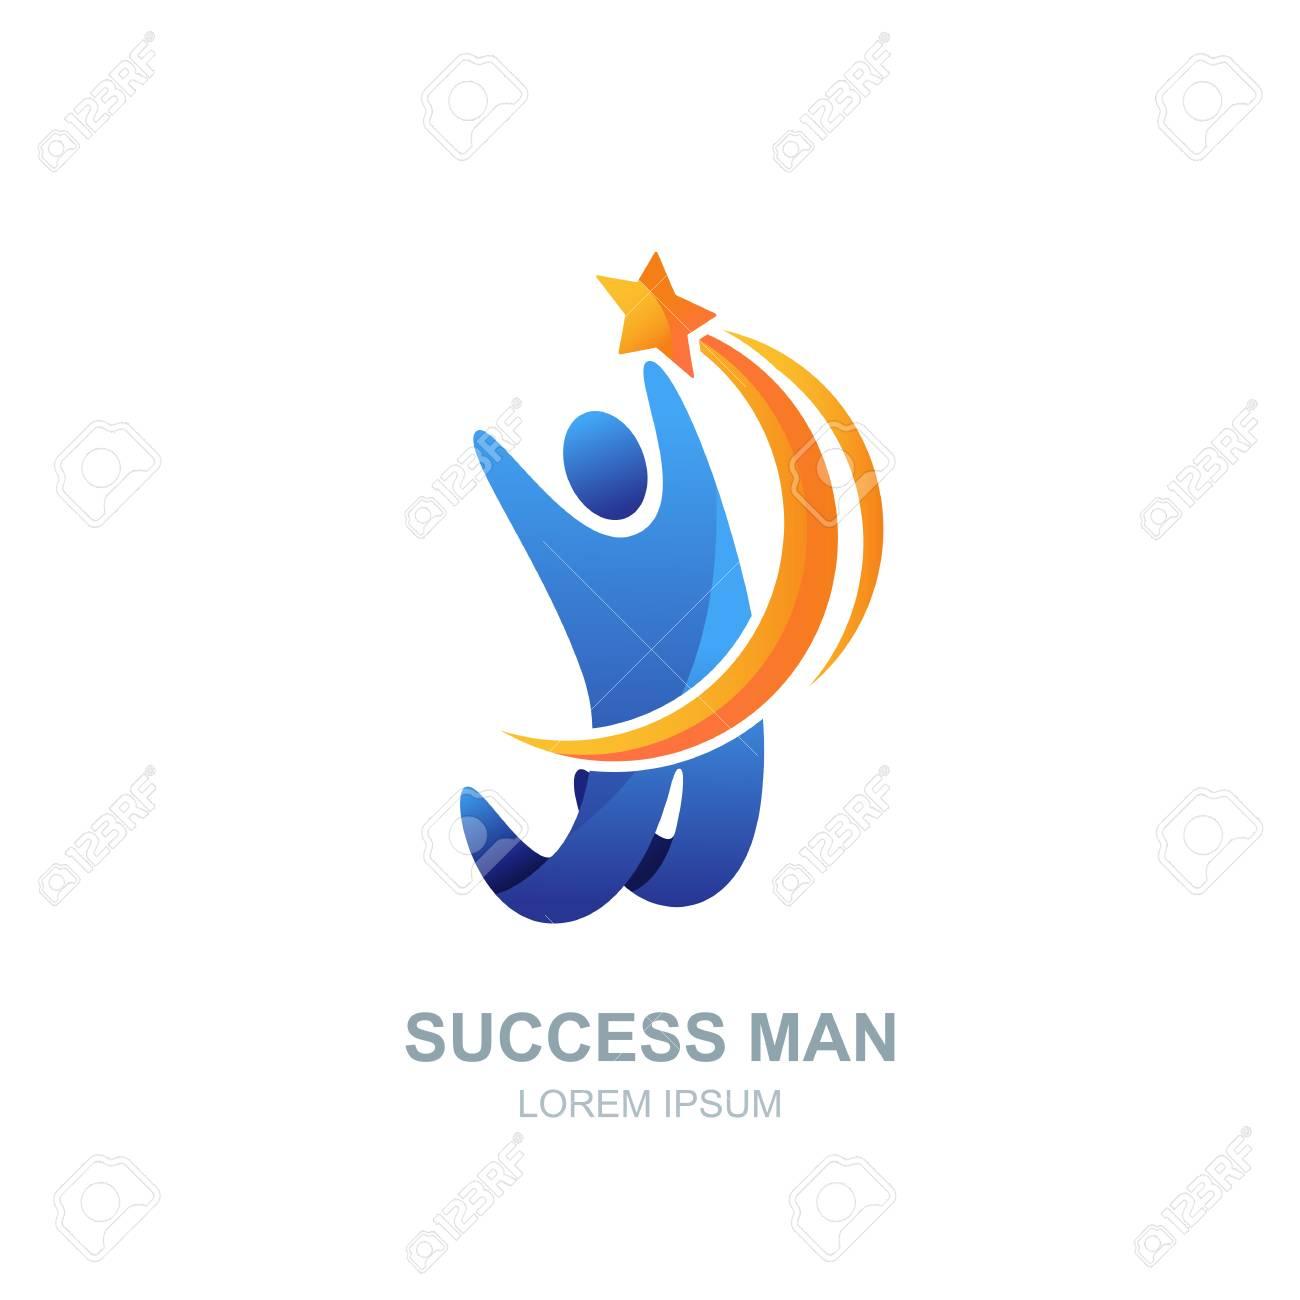 Vector Logo Humano, Icono O Plantilla De Diseño De Emblema. Hombre ...